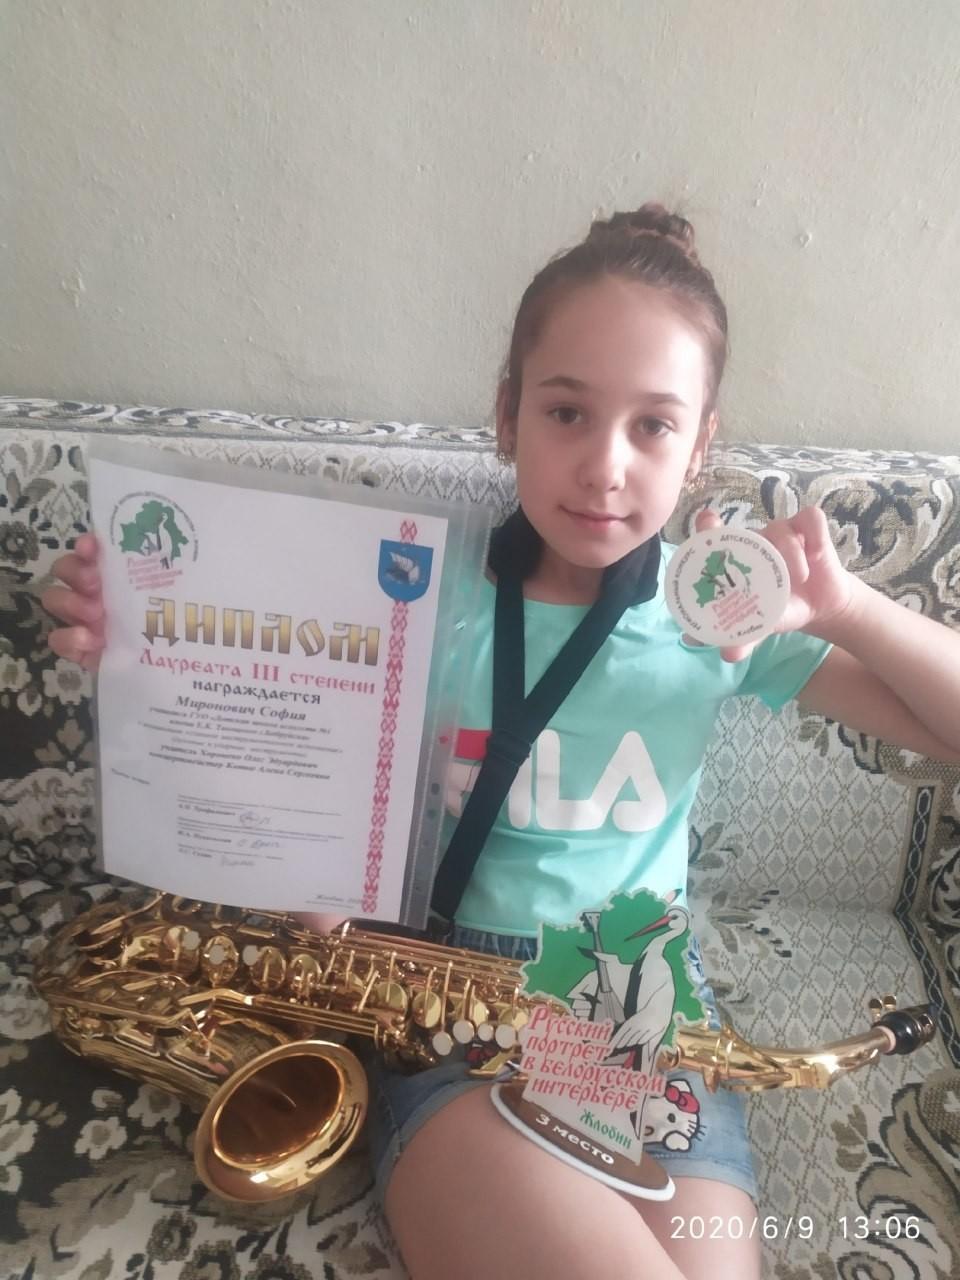 Юные музыканты Бобруйска - лауреаты международных конкурсов